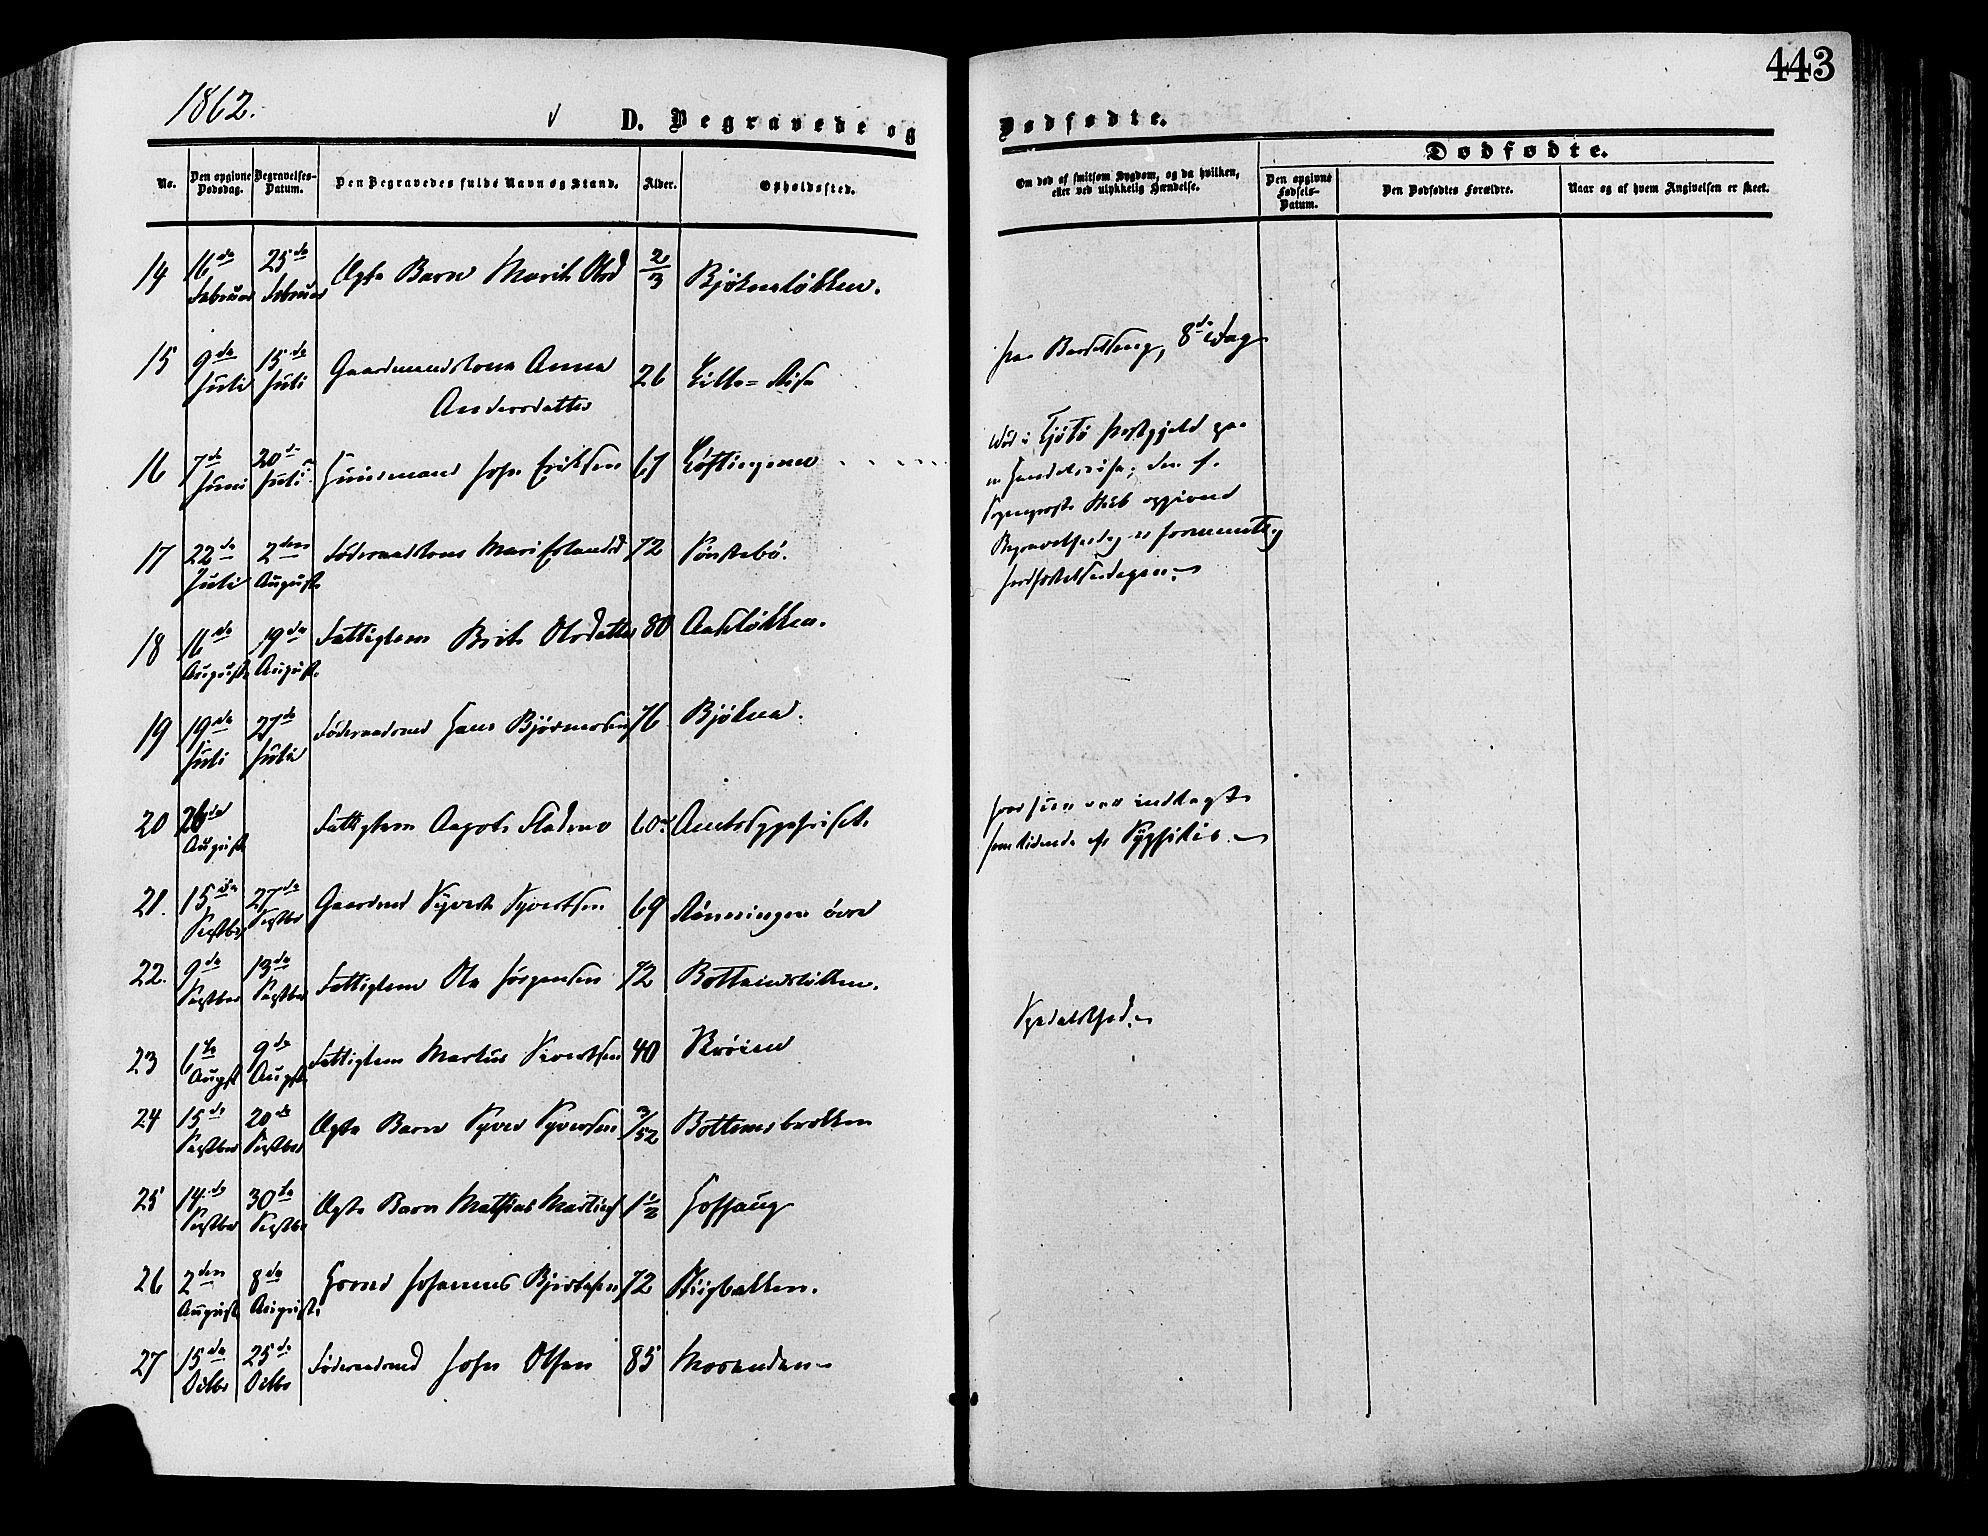 SAH, Lesja prestekontor, Ministerialbok nr. 8, 1854-1880, s. 443